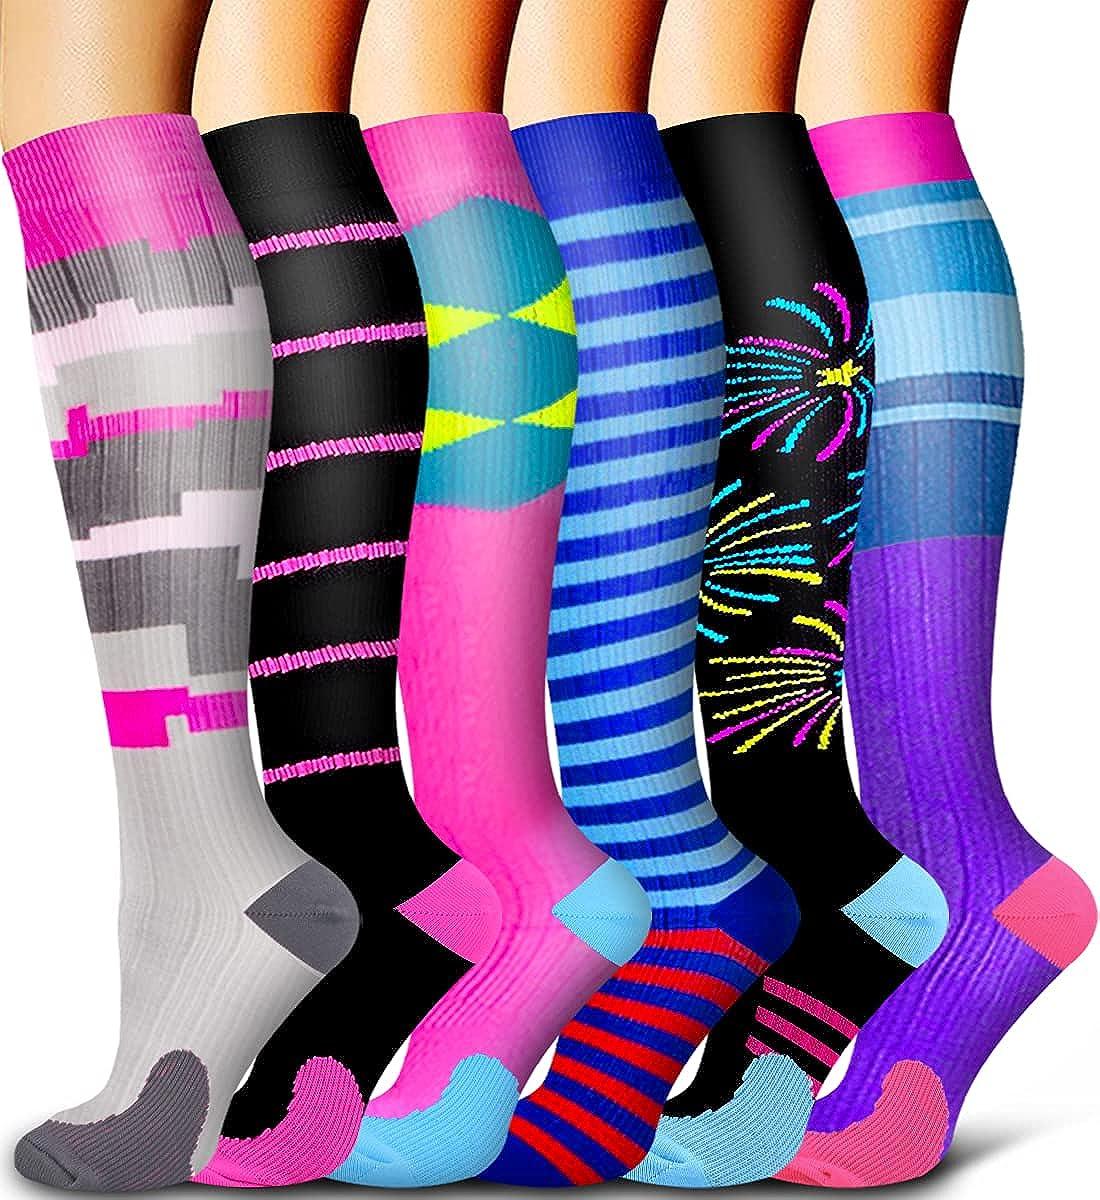 6 Pack Compression Socks Circula Ranking TOP16 - Women Men depot